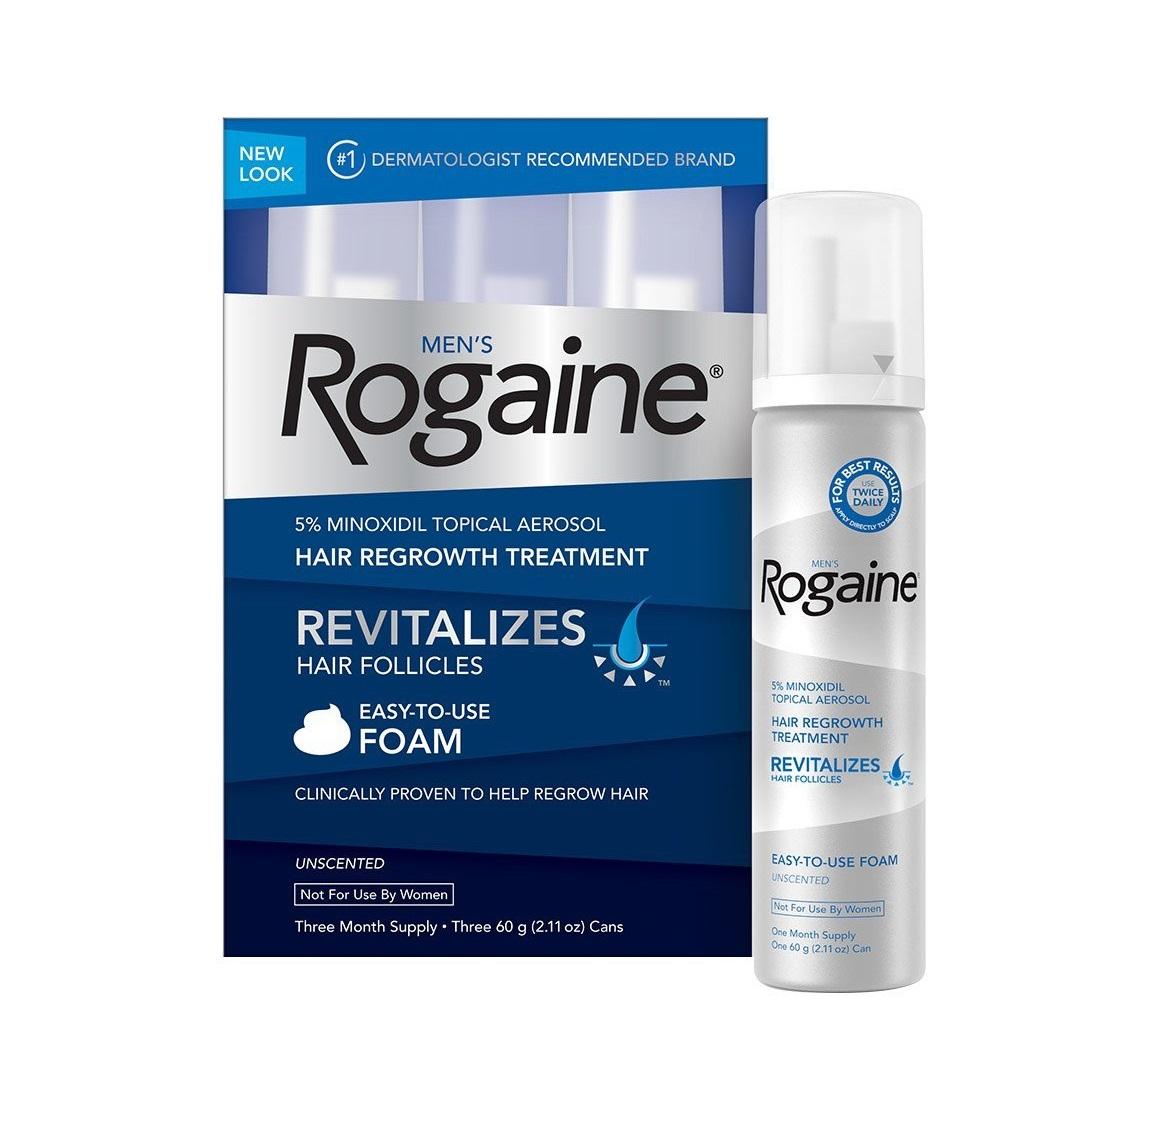 Rogaine Foam 3 Minoxidil Topical Aerosol